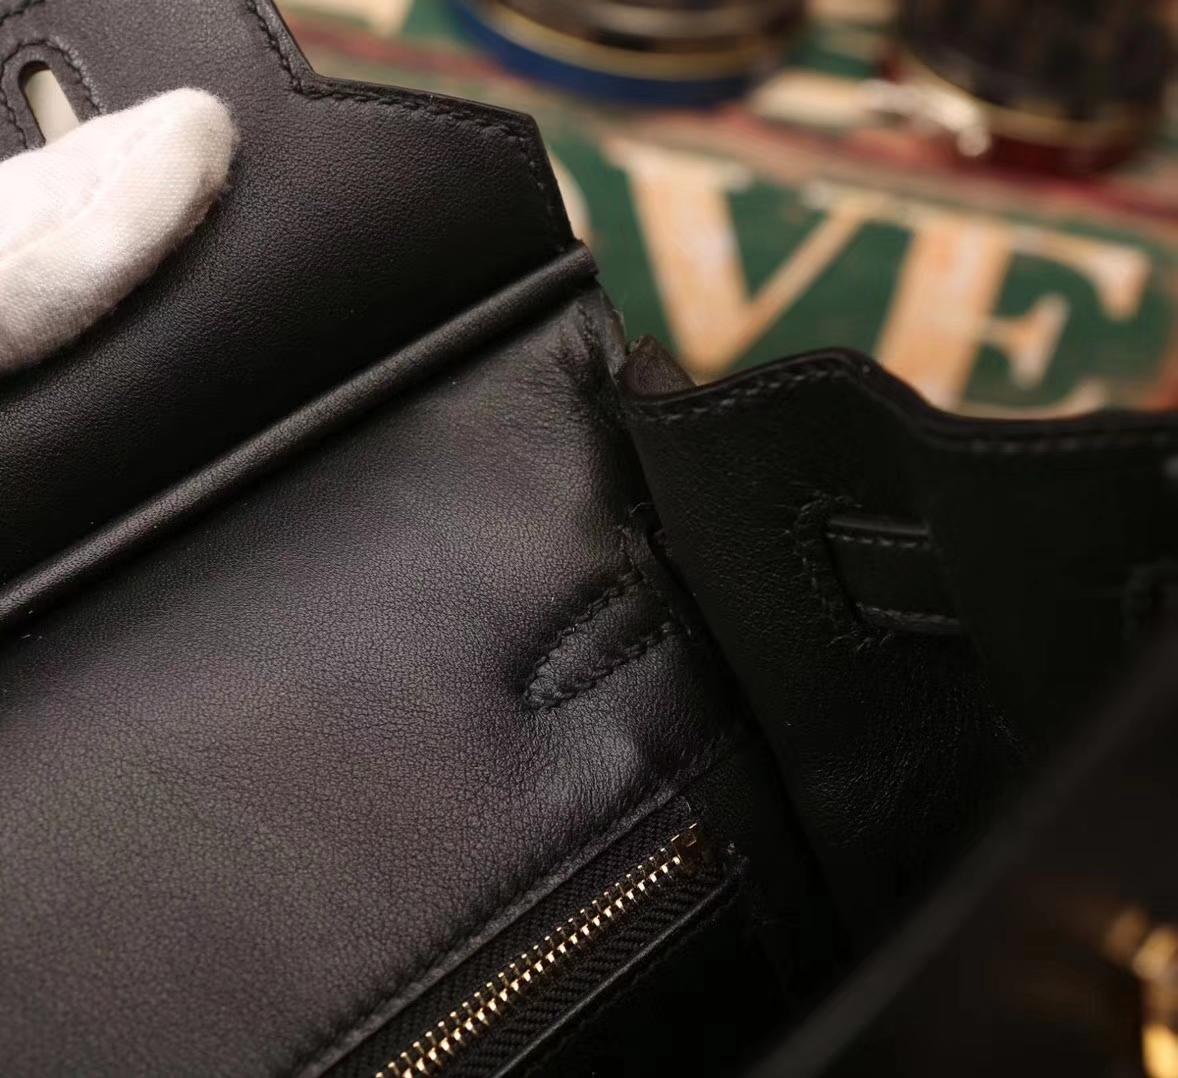 Hermes爱马仕 Birkin 25 CK89 黑色 原厂御用顶级Swift皮 金扣